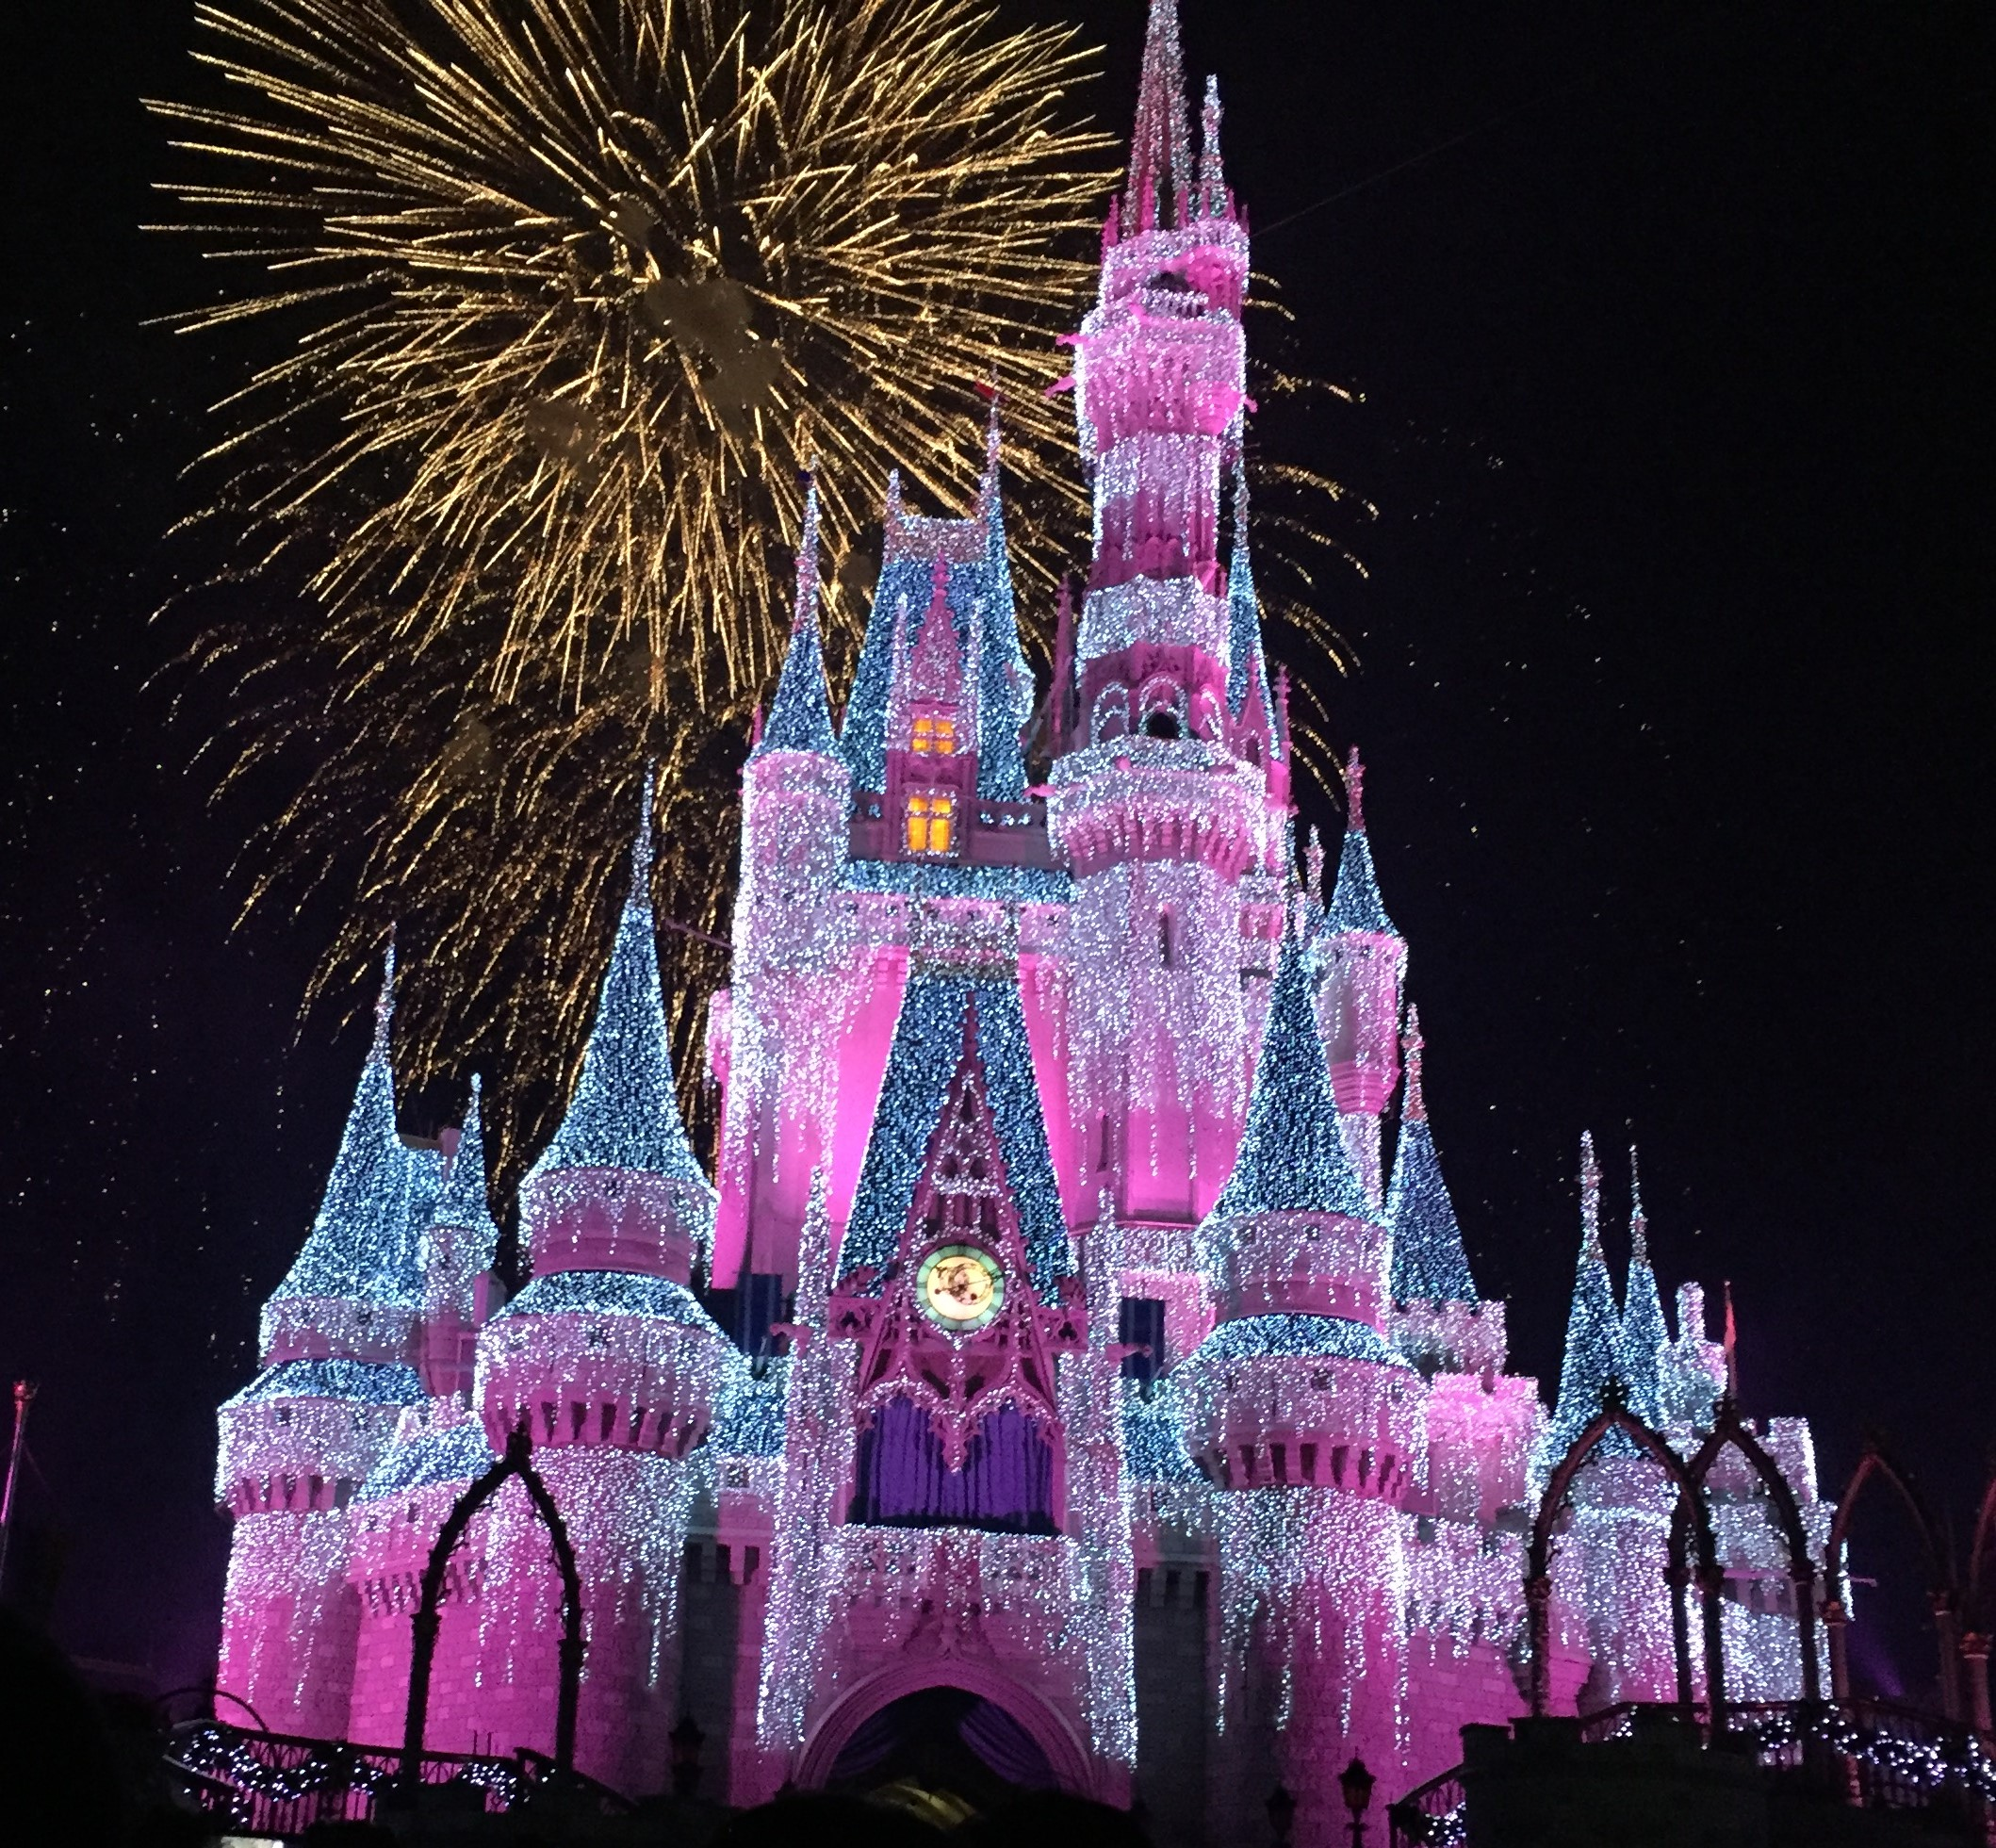 Cinderella Castle Christmas Lights.Disney Christmas Lights The Affordable Mouse